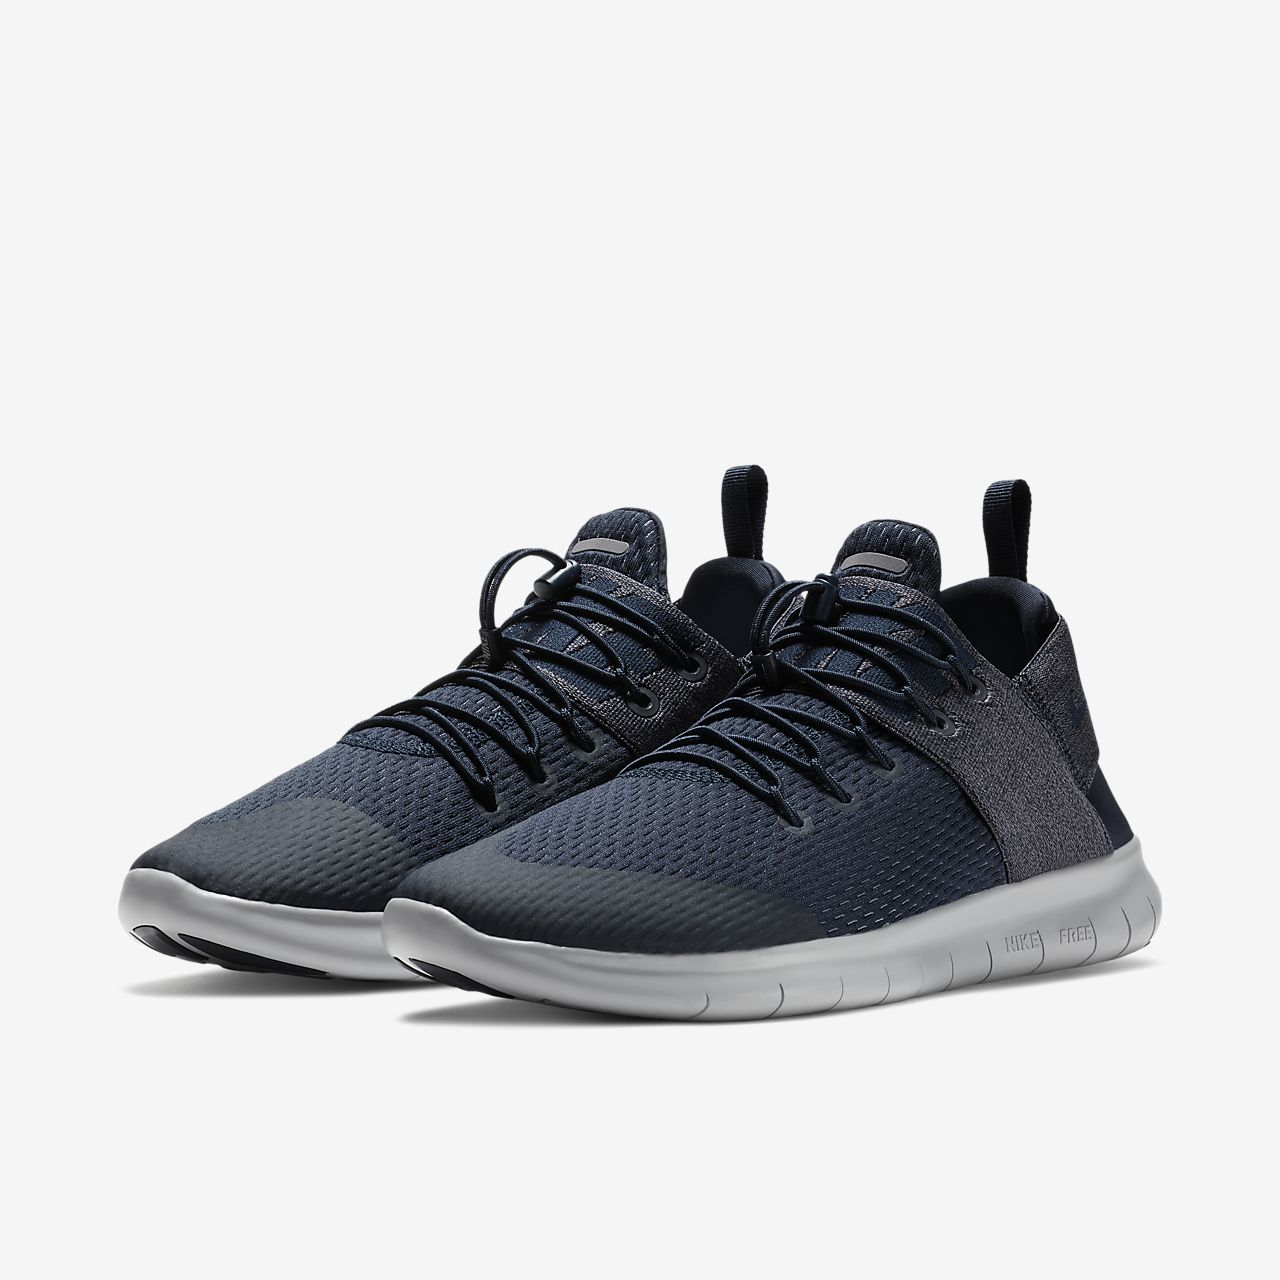 ... Nike Free RN Commuter 2017 Herren-Laufschuh